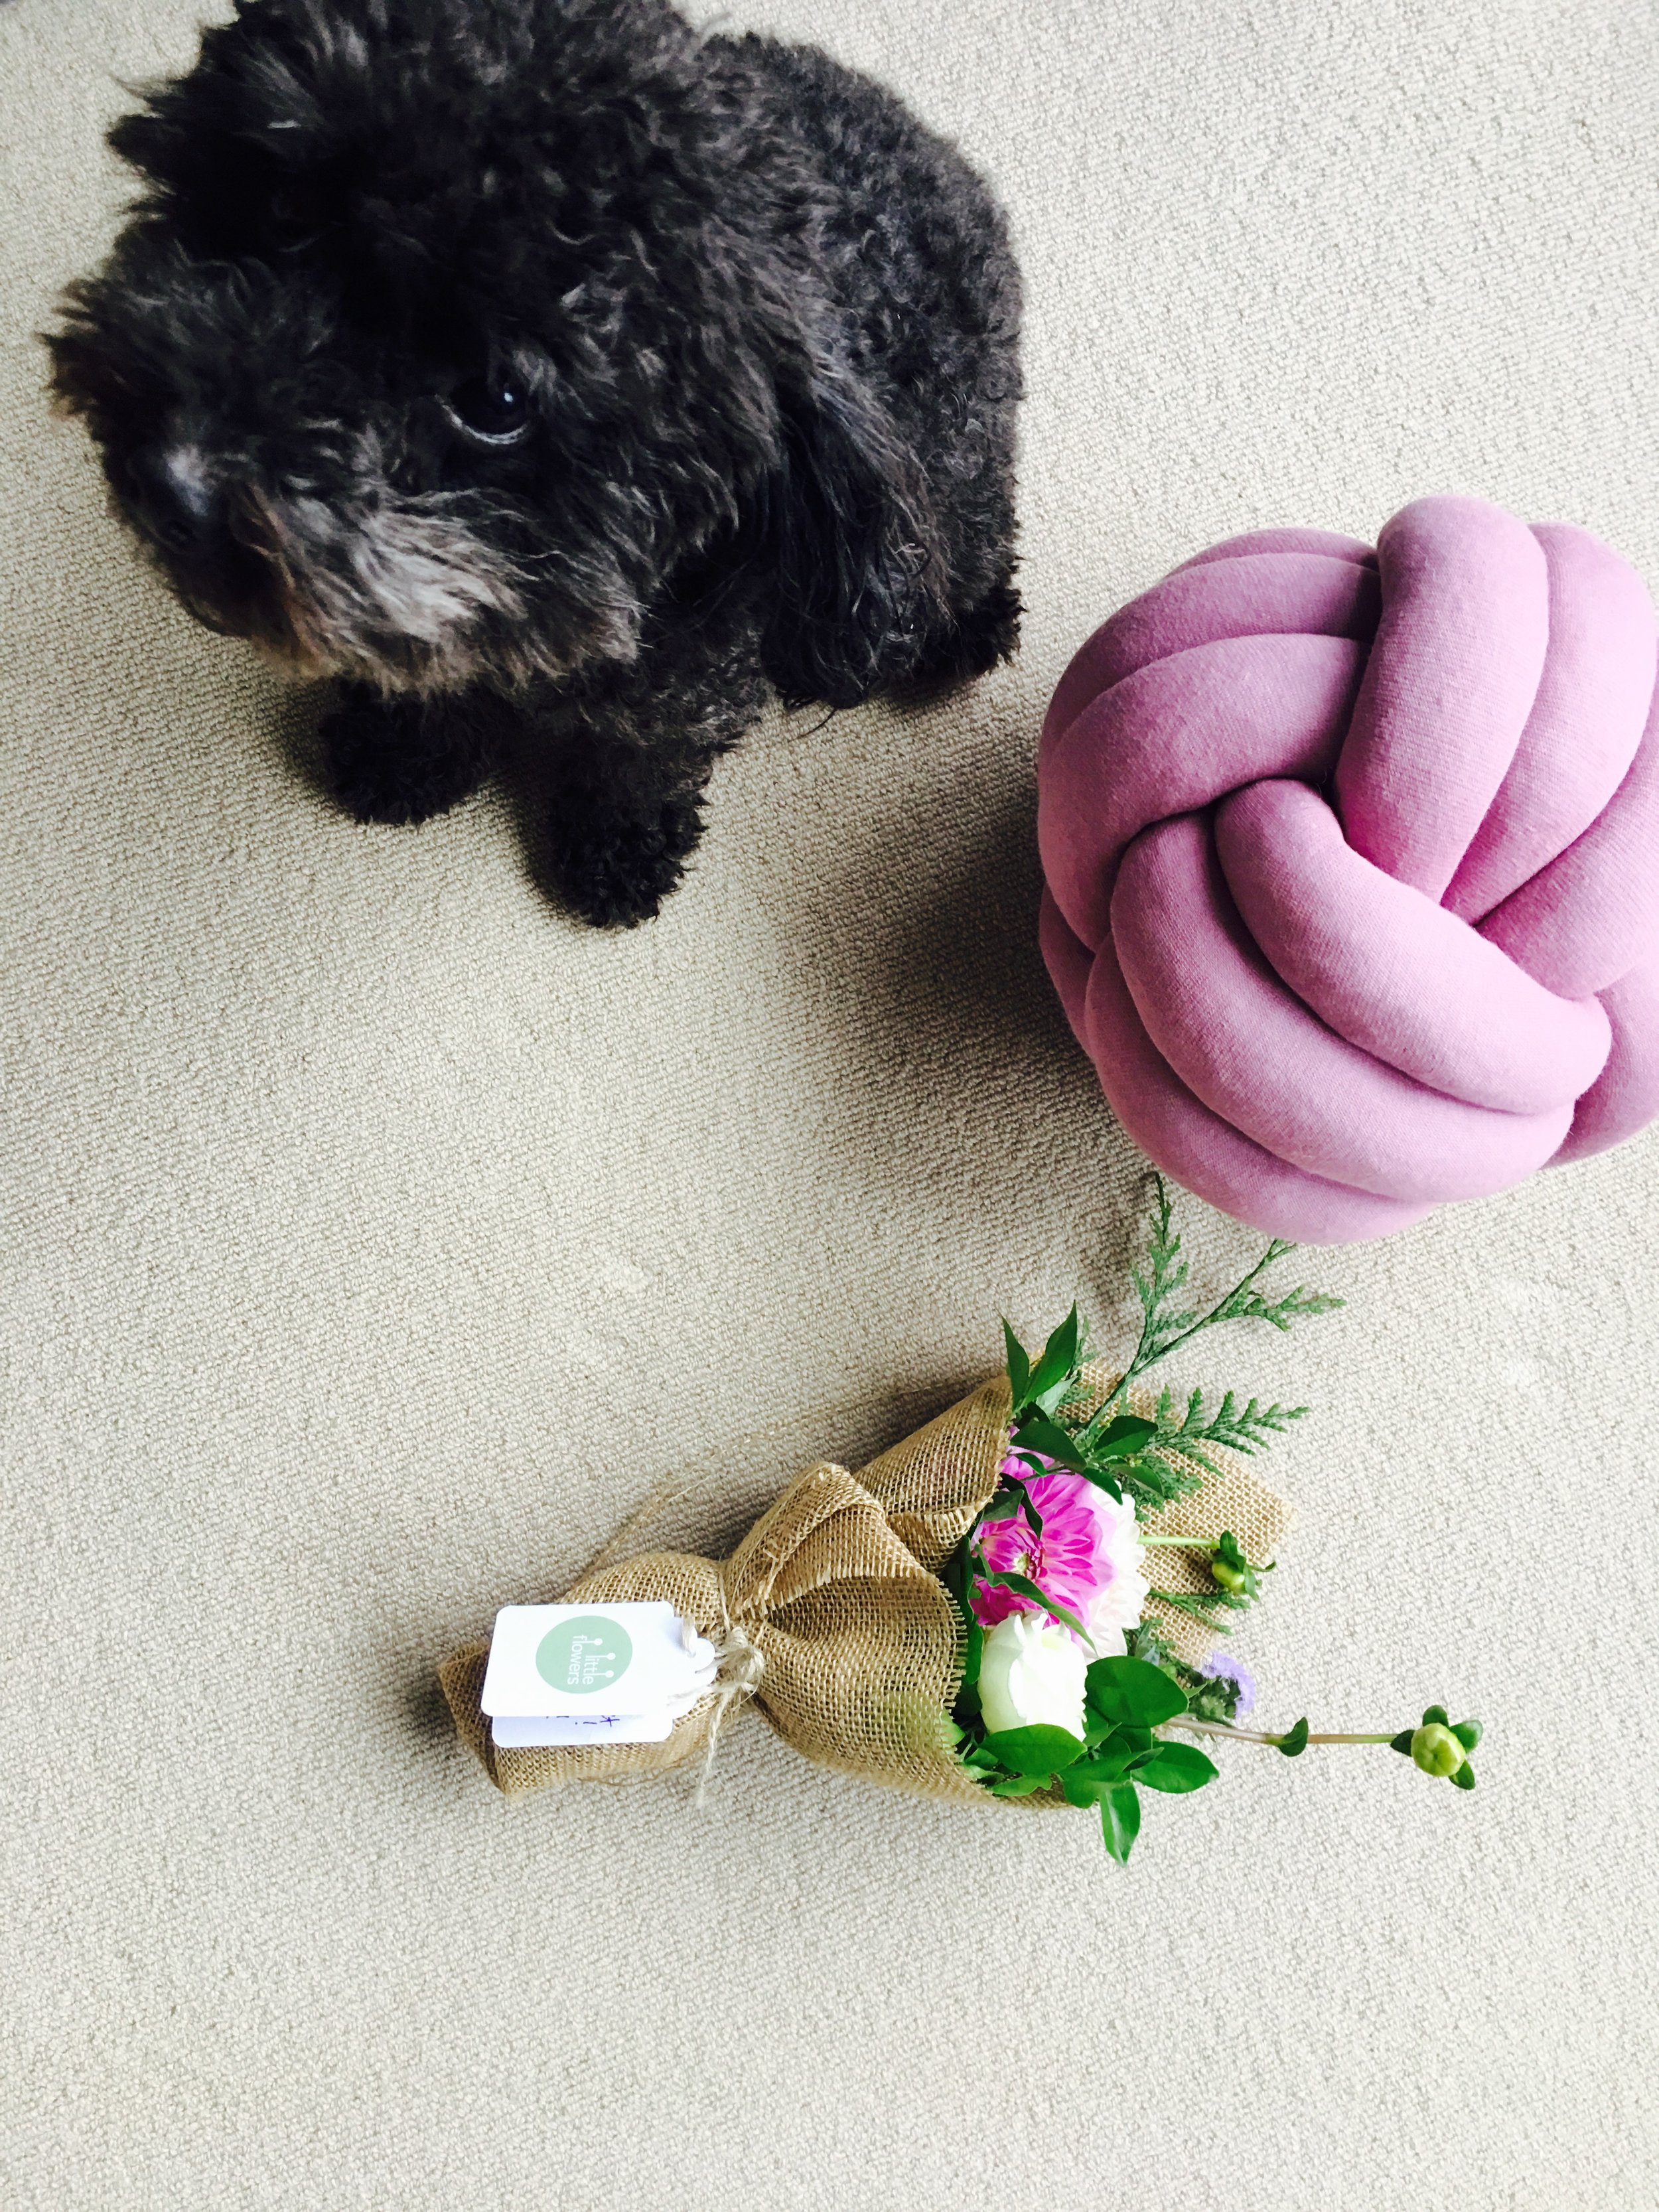 Black doggy, knot cushion & little posy